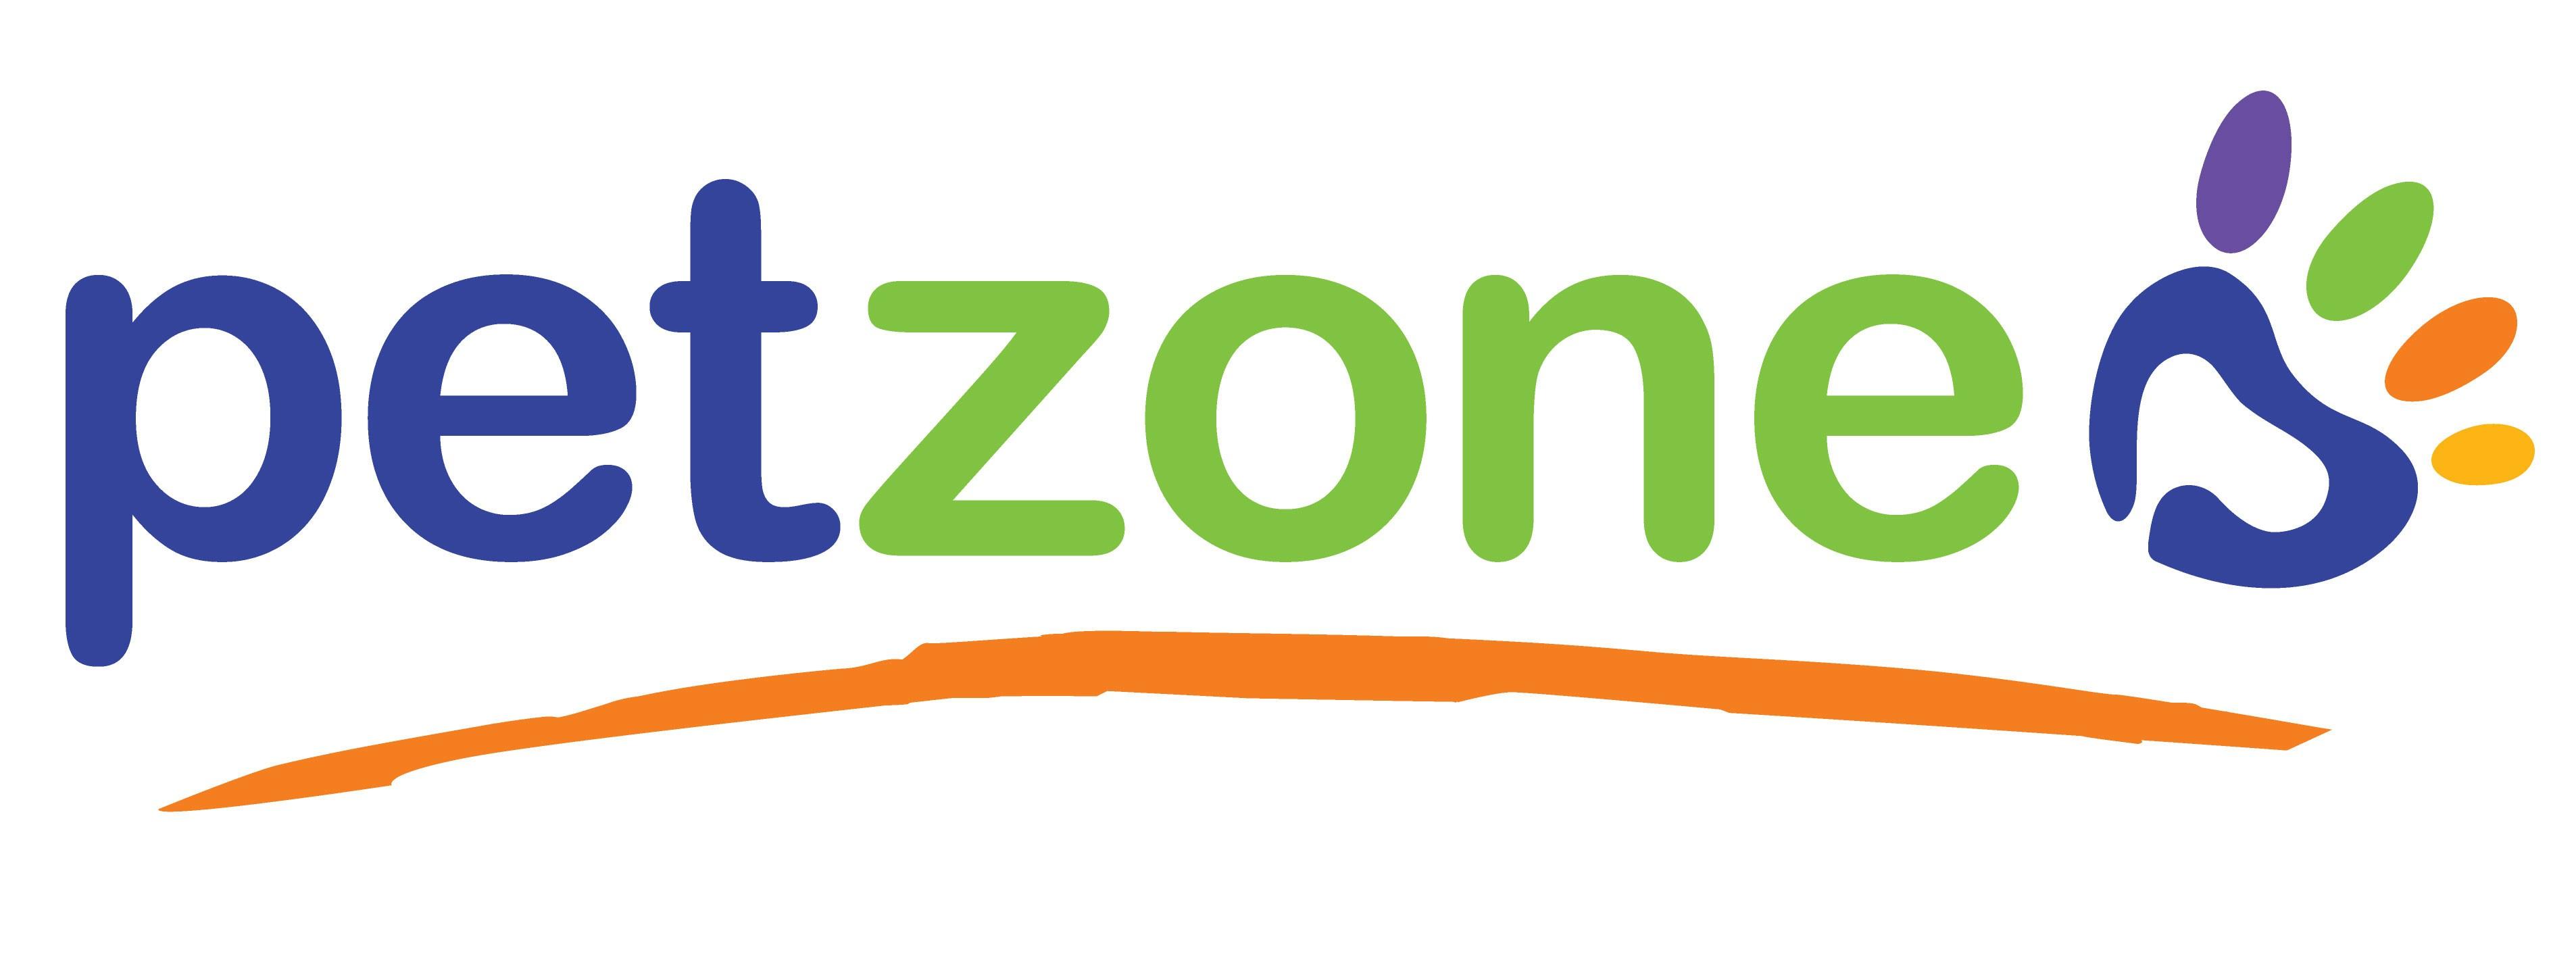 petzone logo